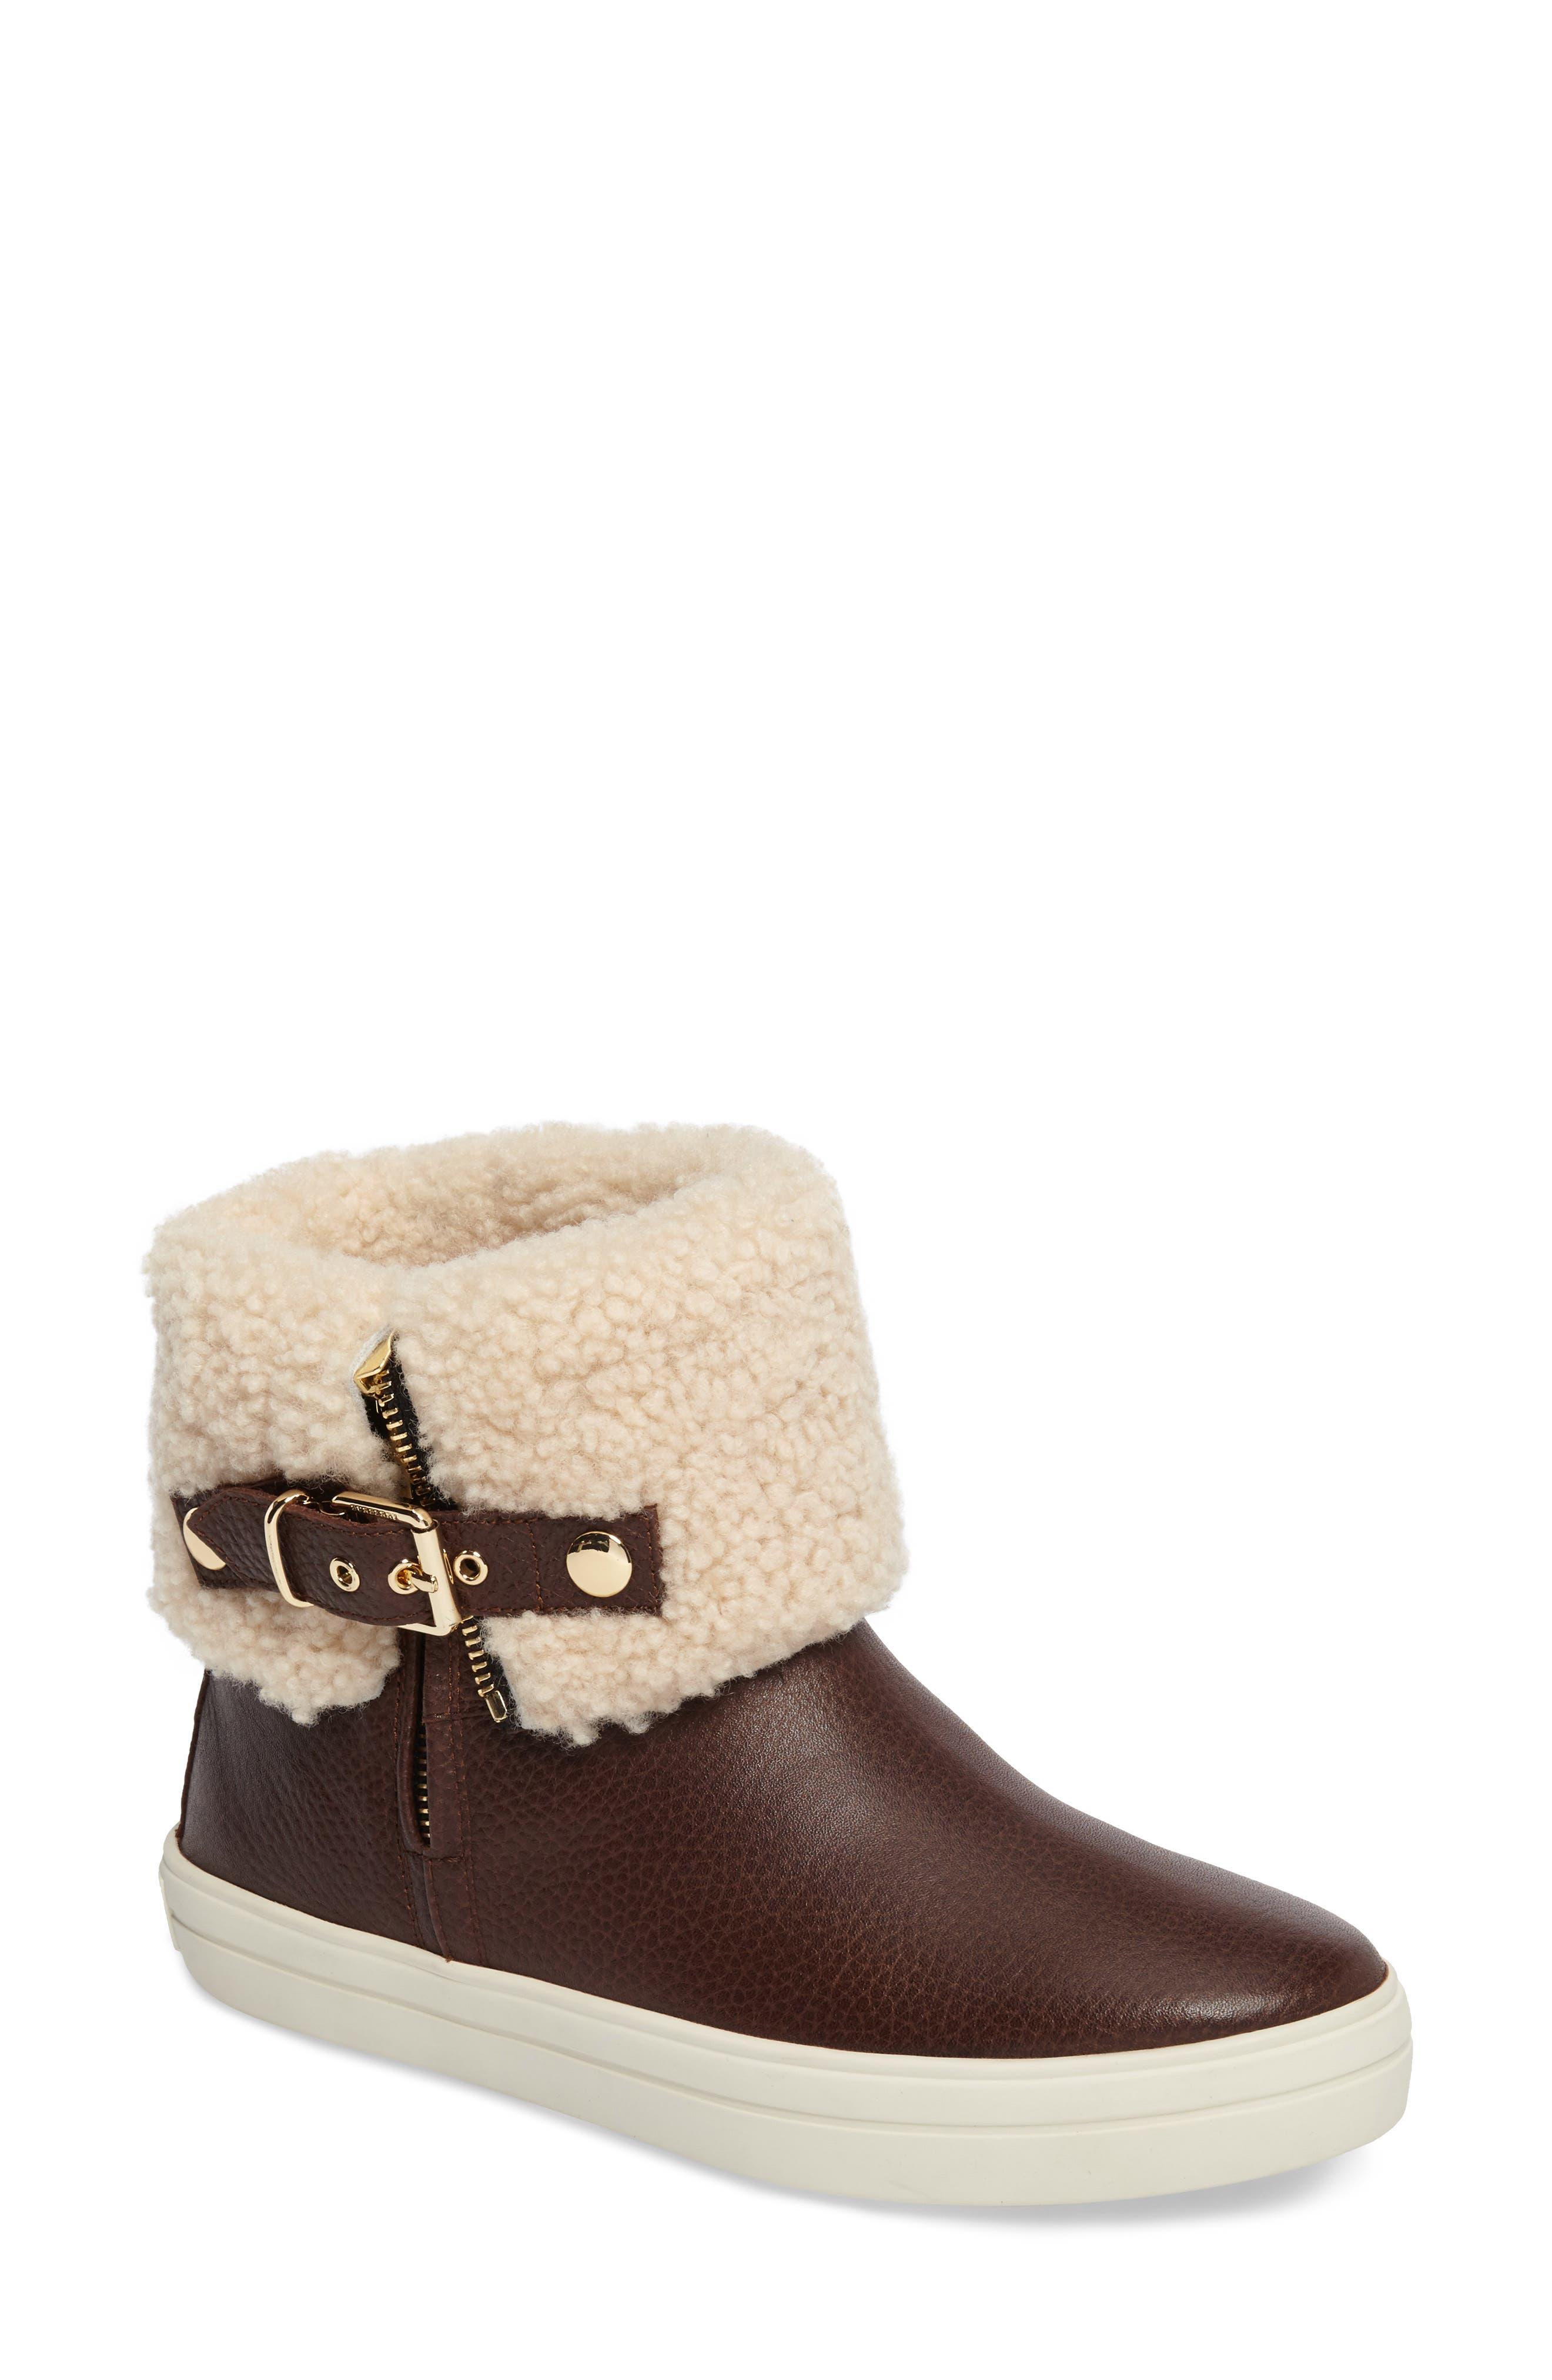 Alternate Image 1 Selected - Burberry Genuine Shearling Boot (Women)